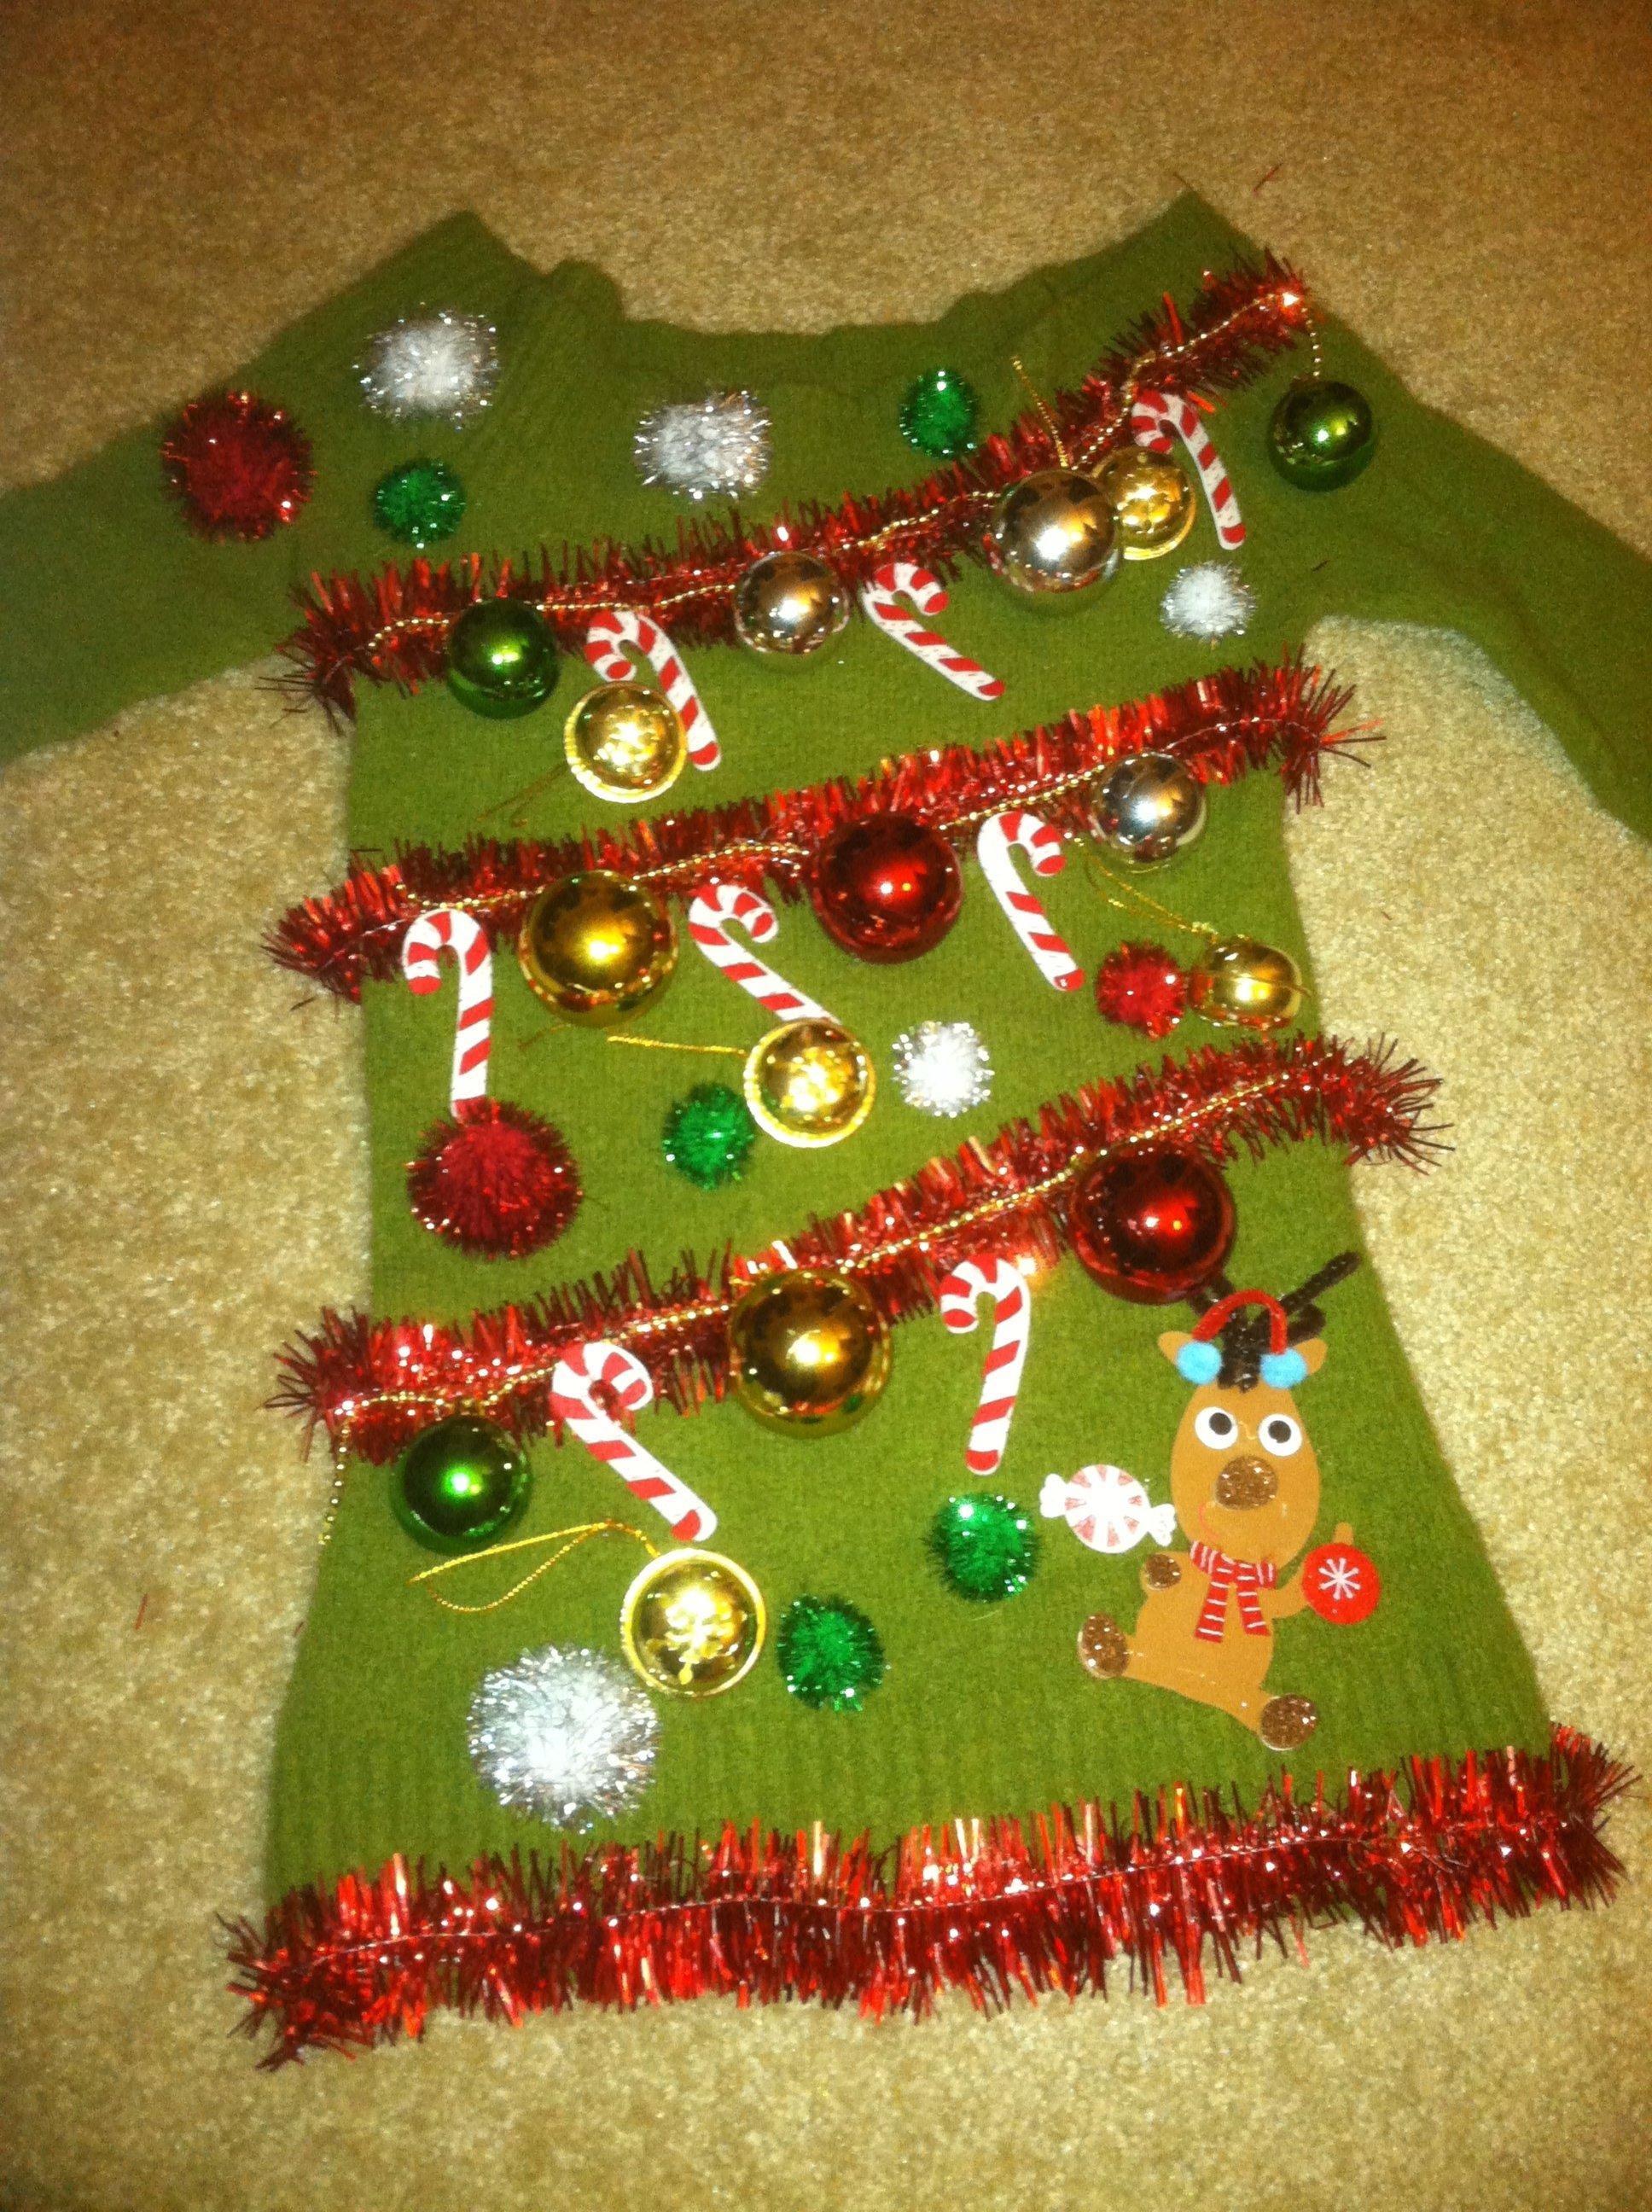 10 Stylish Ugly Christmas Sweaters Ideas Homemade diy ugly christmas sweaters that prove youre awesome sweater ideas 2021